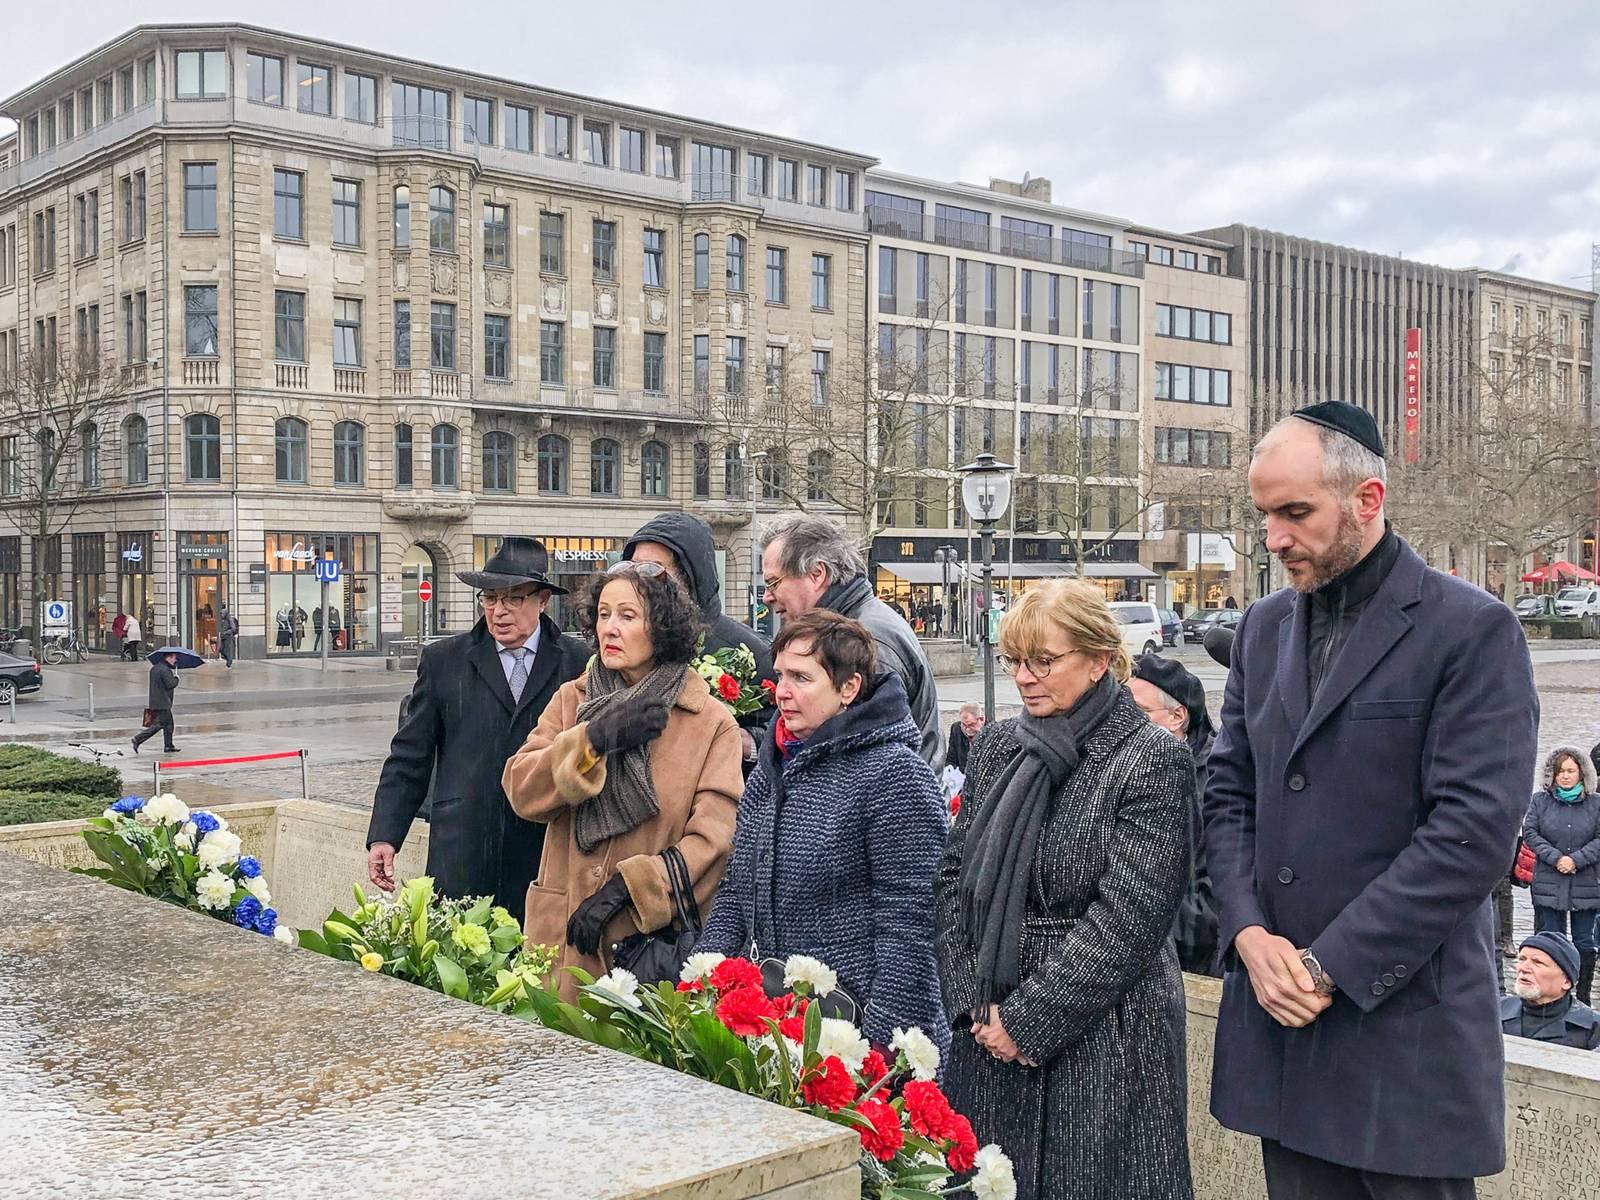 Mehrere Personen halten am Holocaust-Mahnmal inne